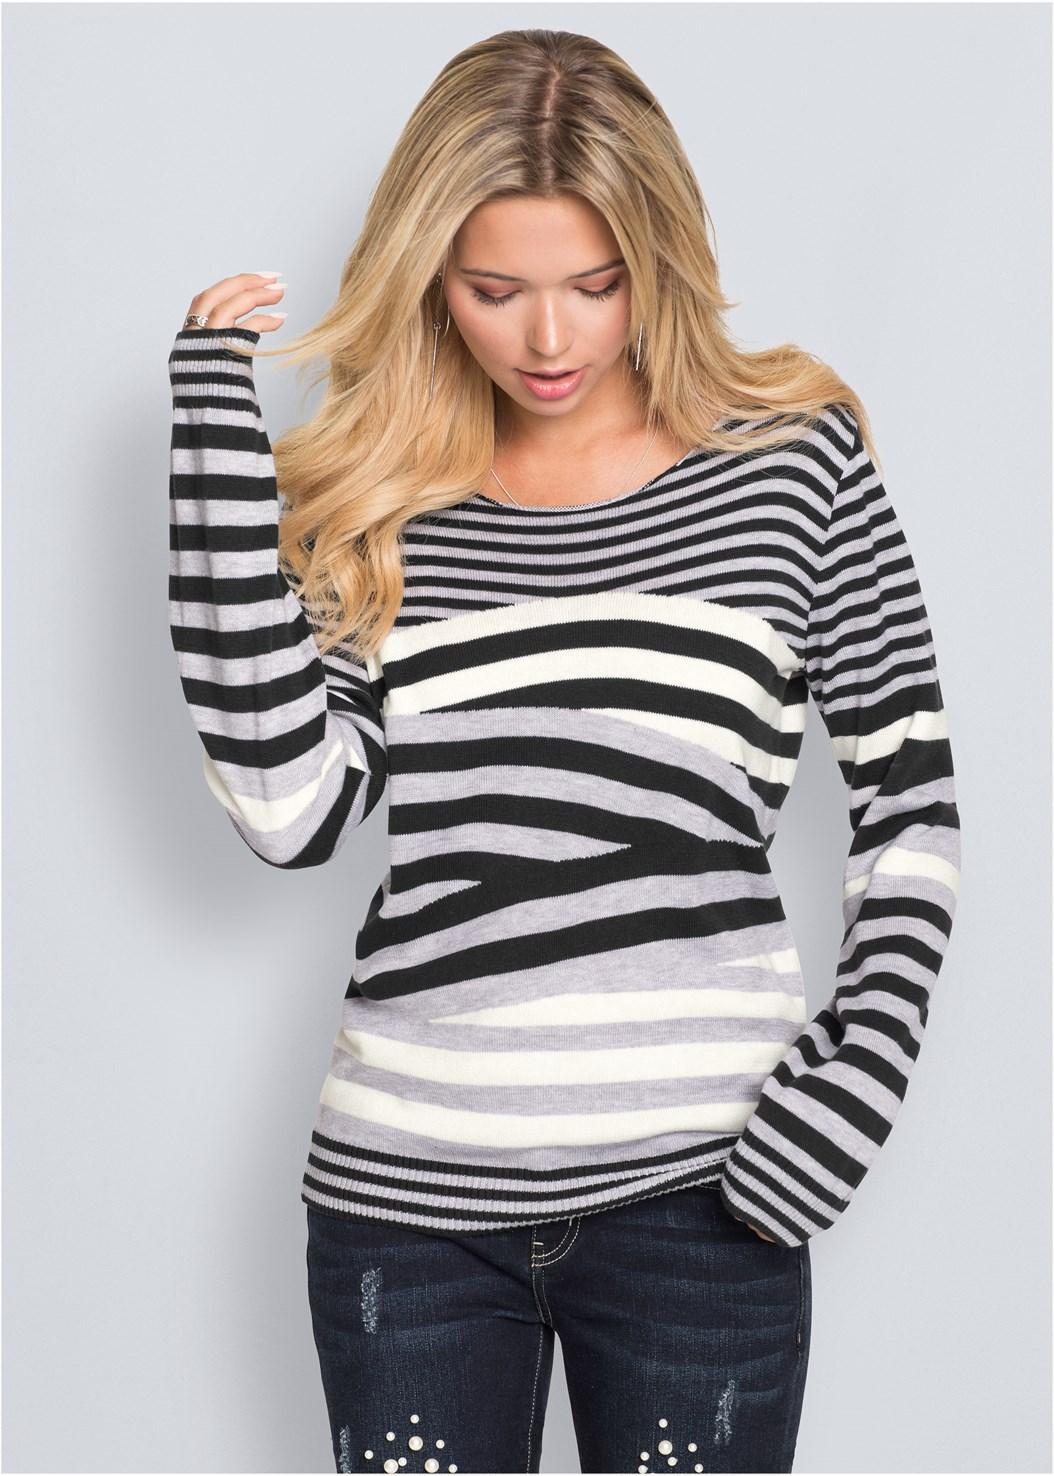 Striped Crew Neck Sweater,Sweater Trim Boot